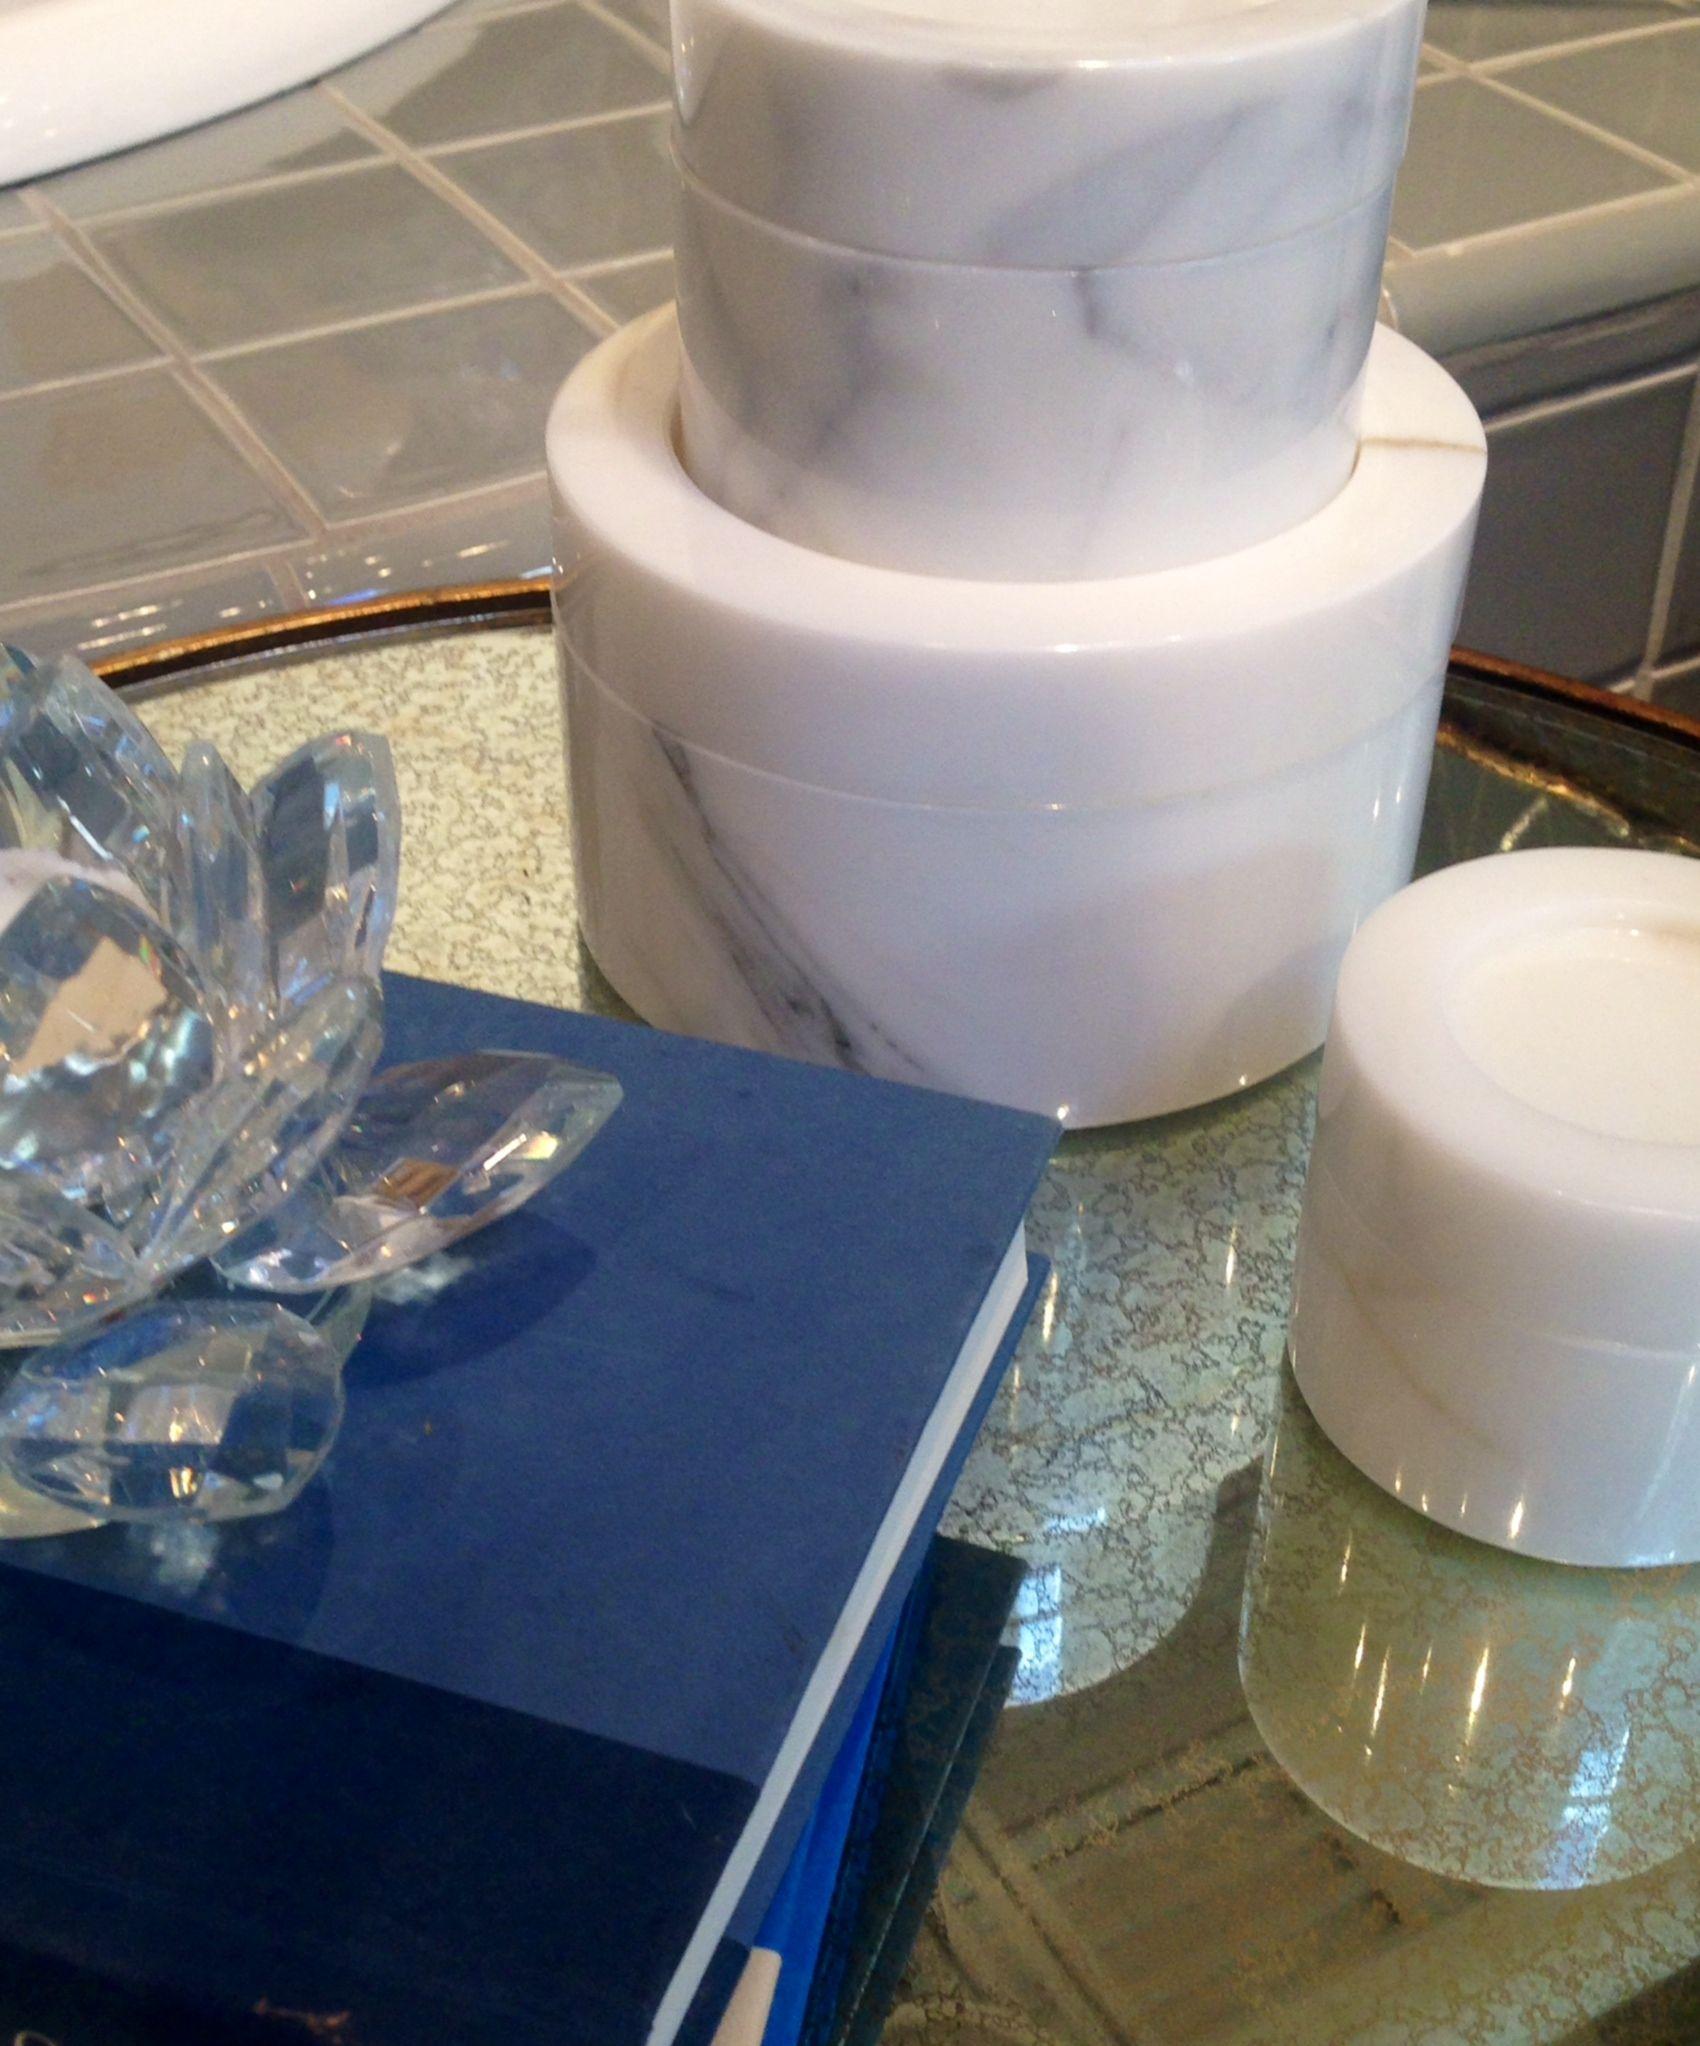 Here's a sneak peek of Dawn Jacobs' (Artichoke Interiors) Powder Room Vignette in Ann Sacks, suite 91